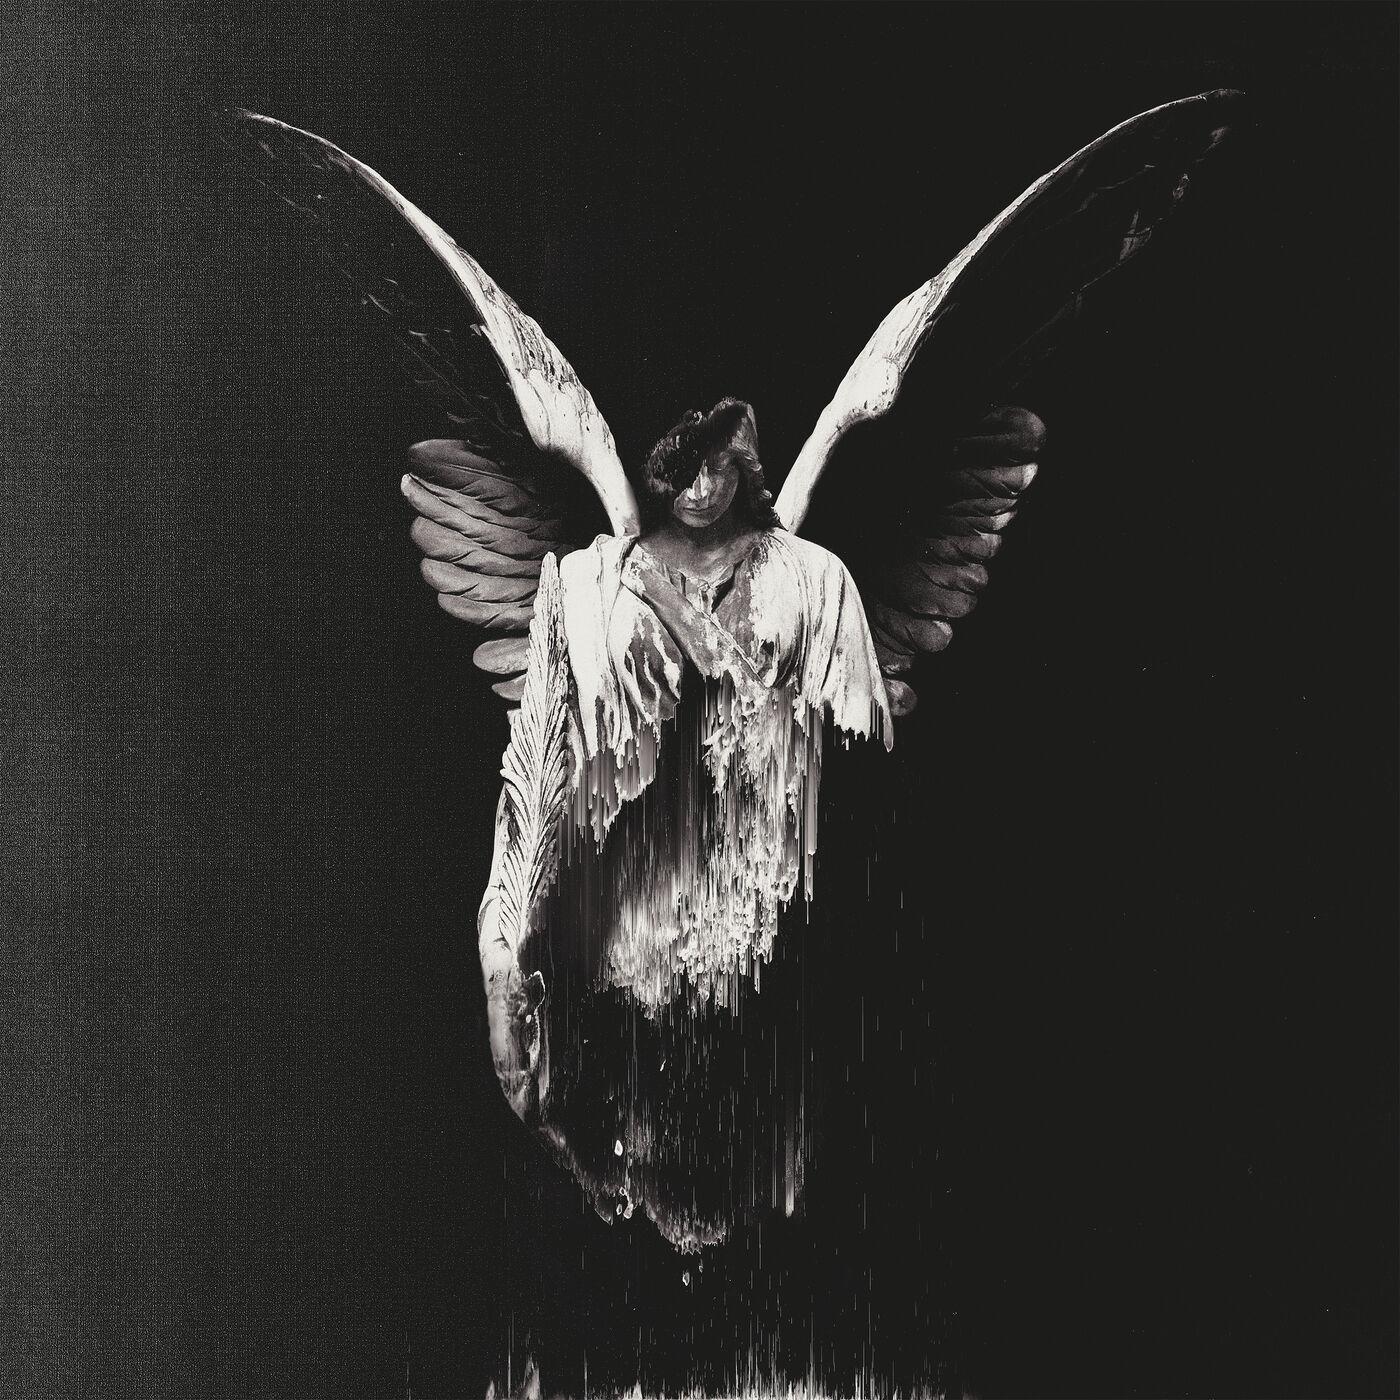 Underoath - Erase Me (Deluxe Edition) (2019)